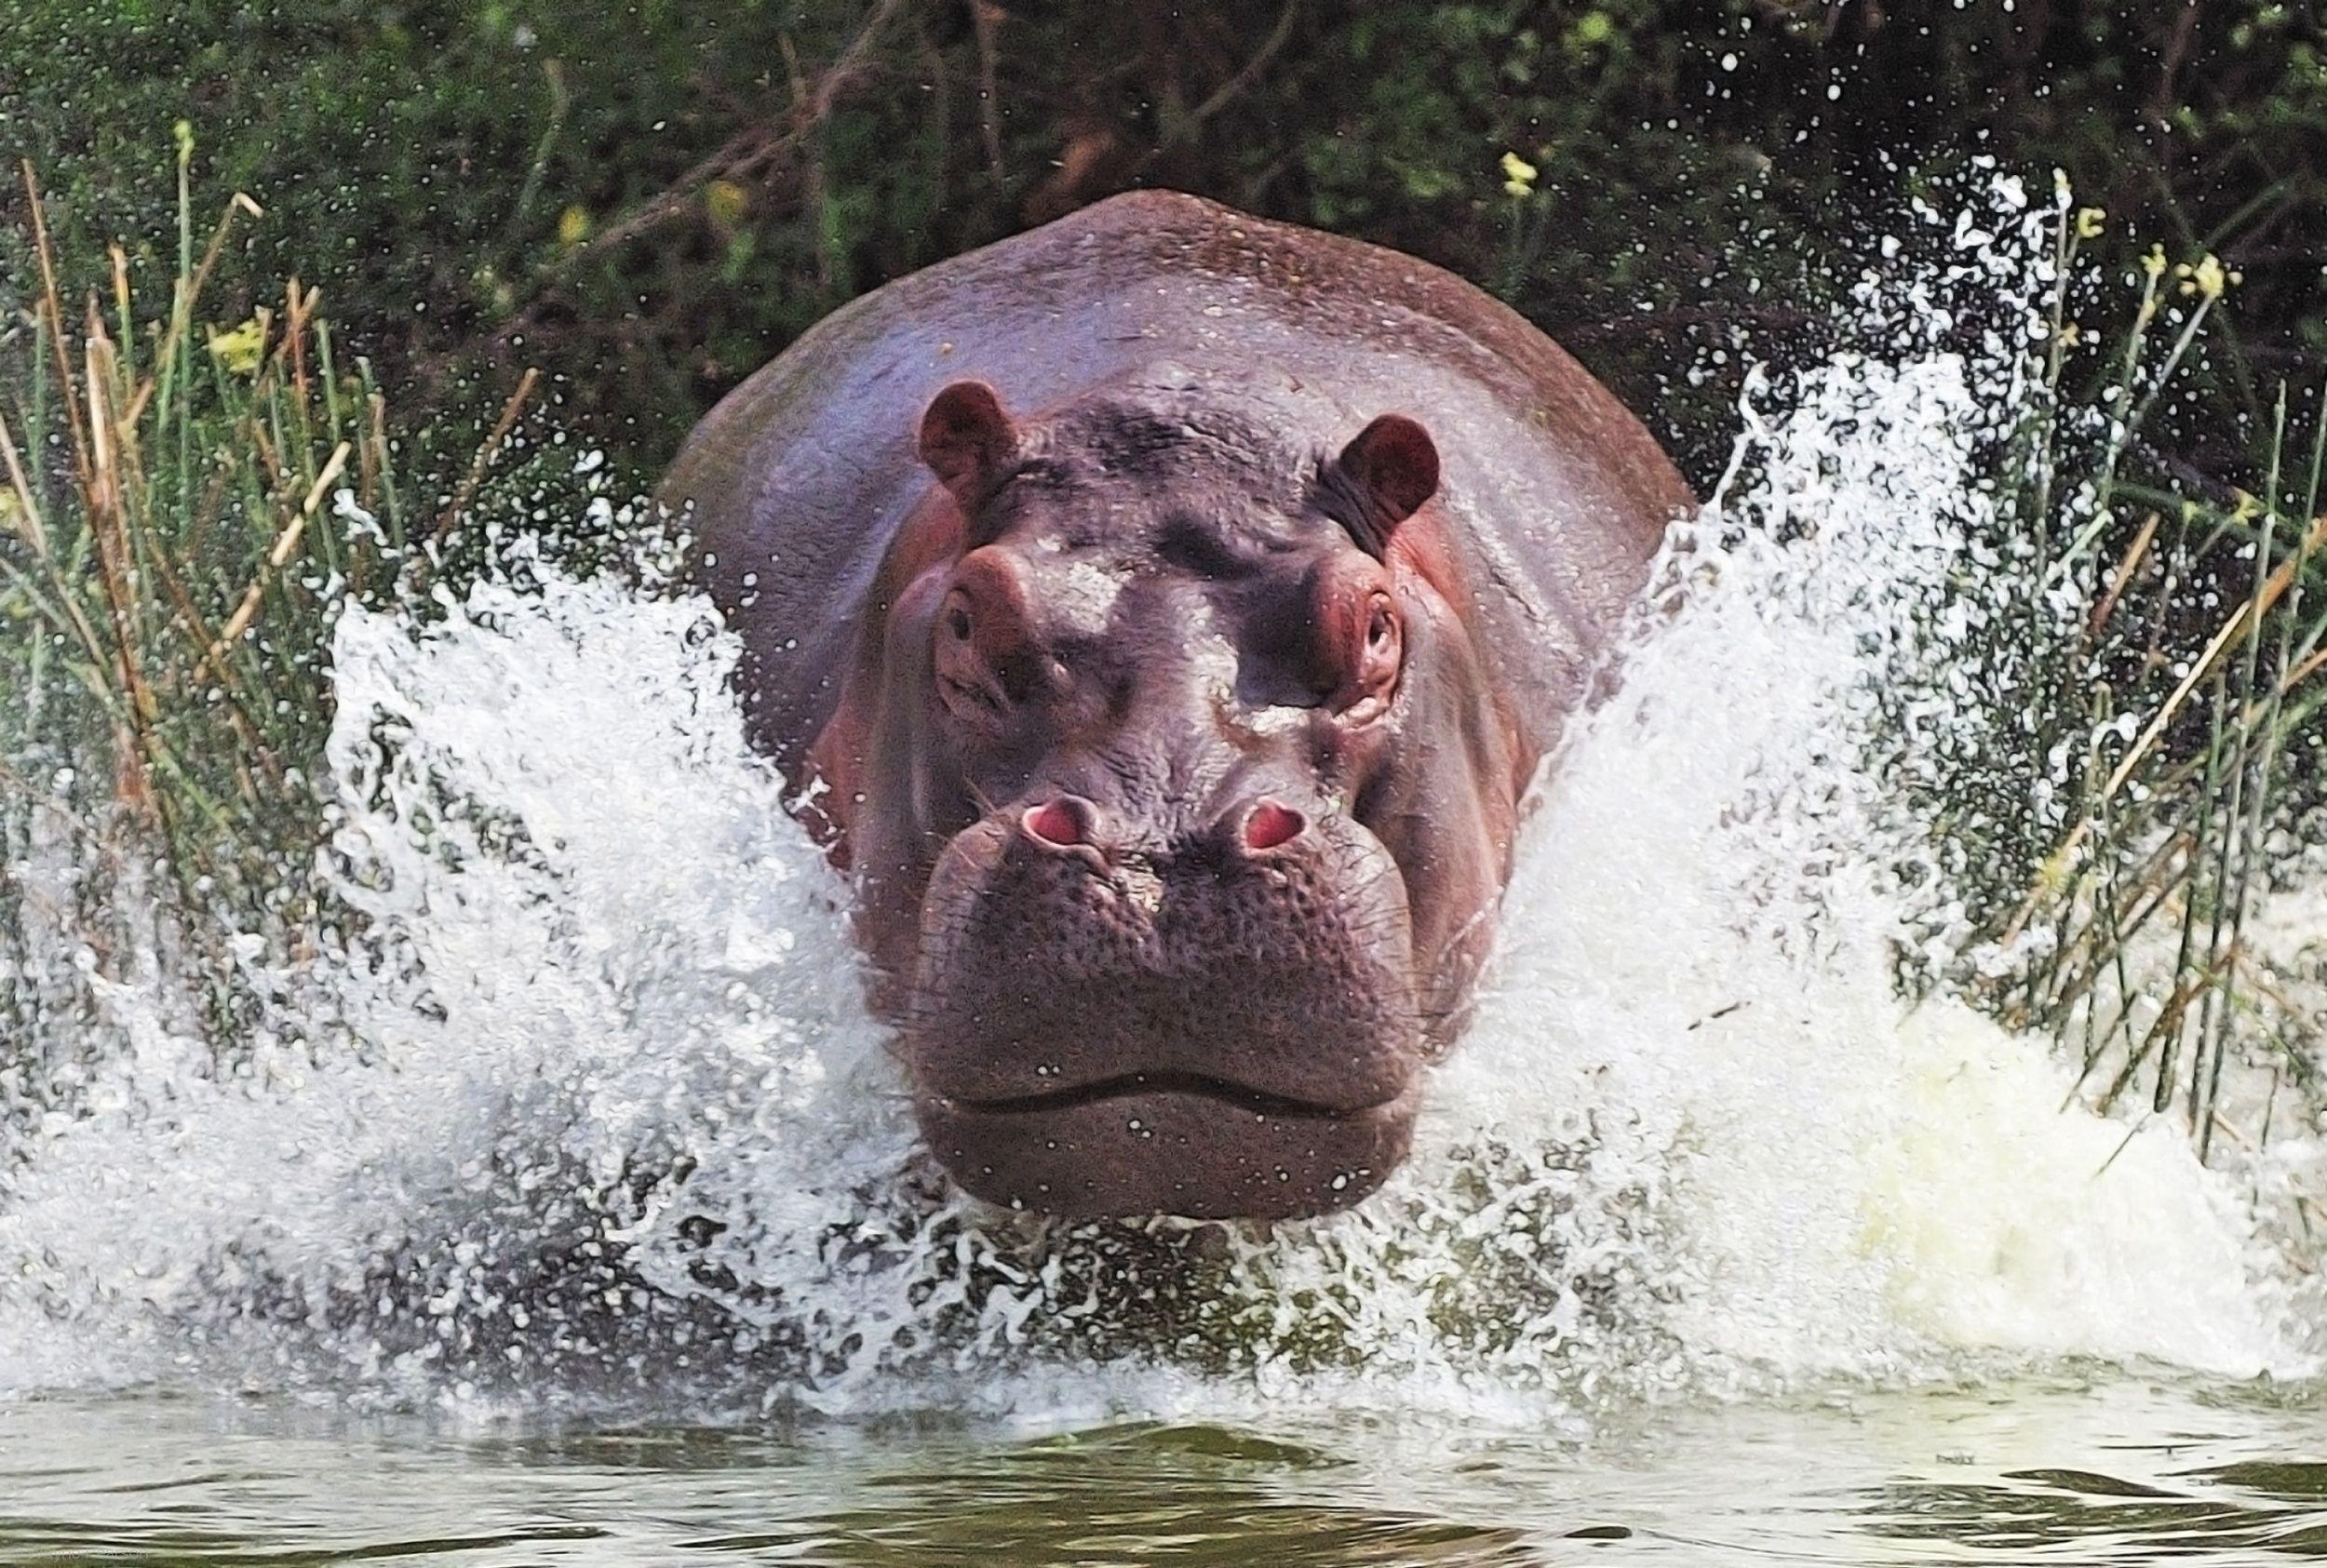 hippopotamus wallpaper | Hippos for Terry | Pinterest | Animales ...